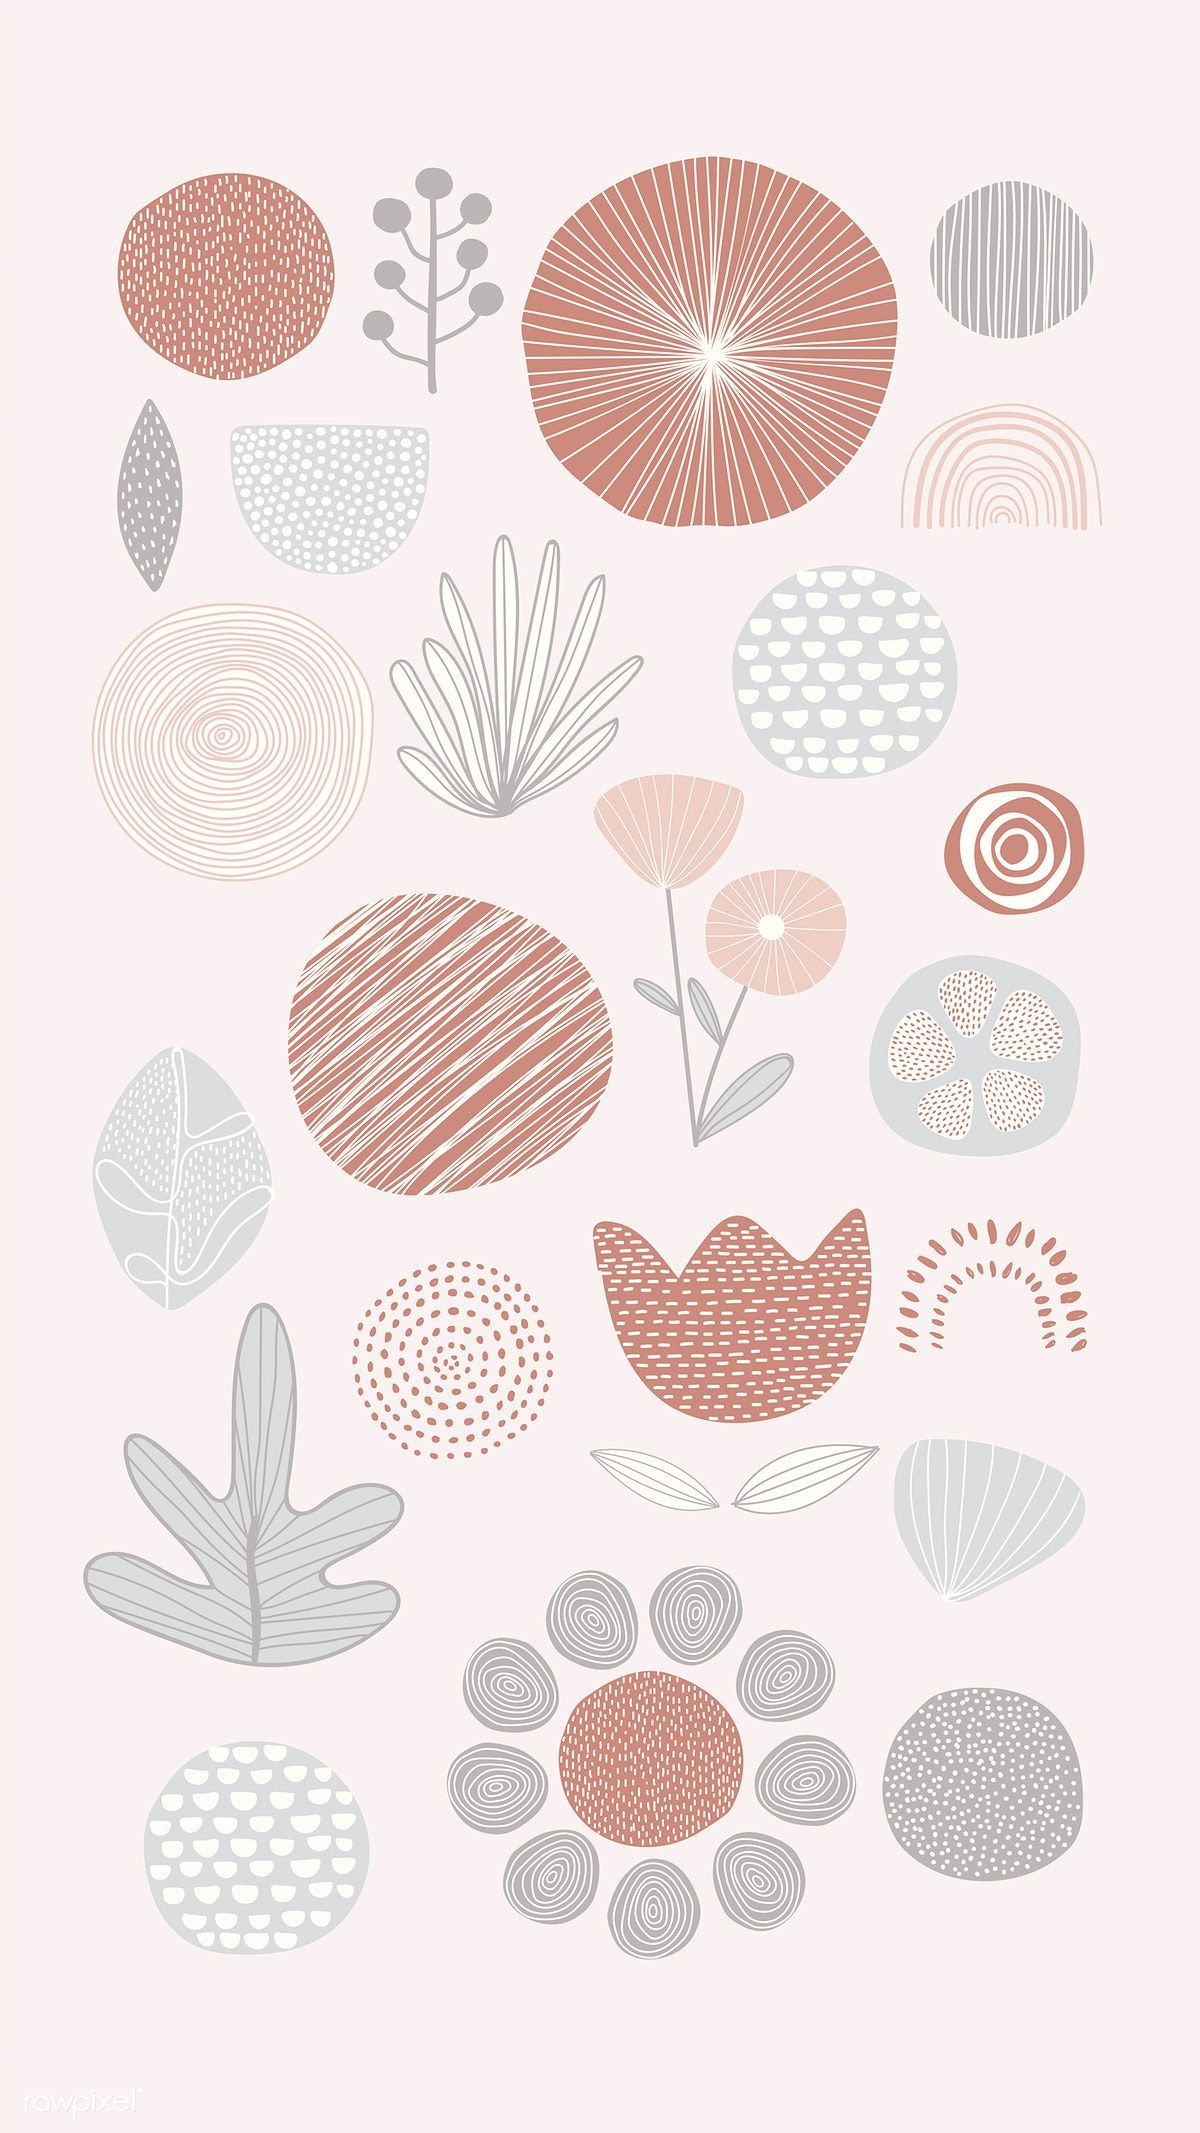 Download premium vector of Natural patterned doodle background vector